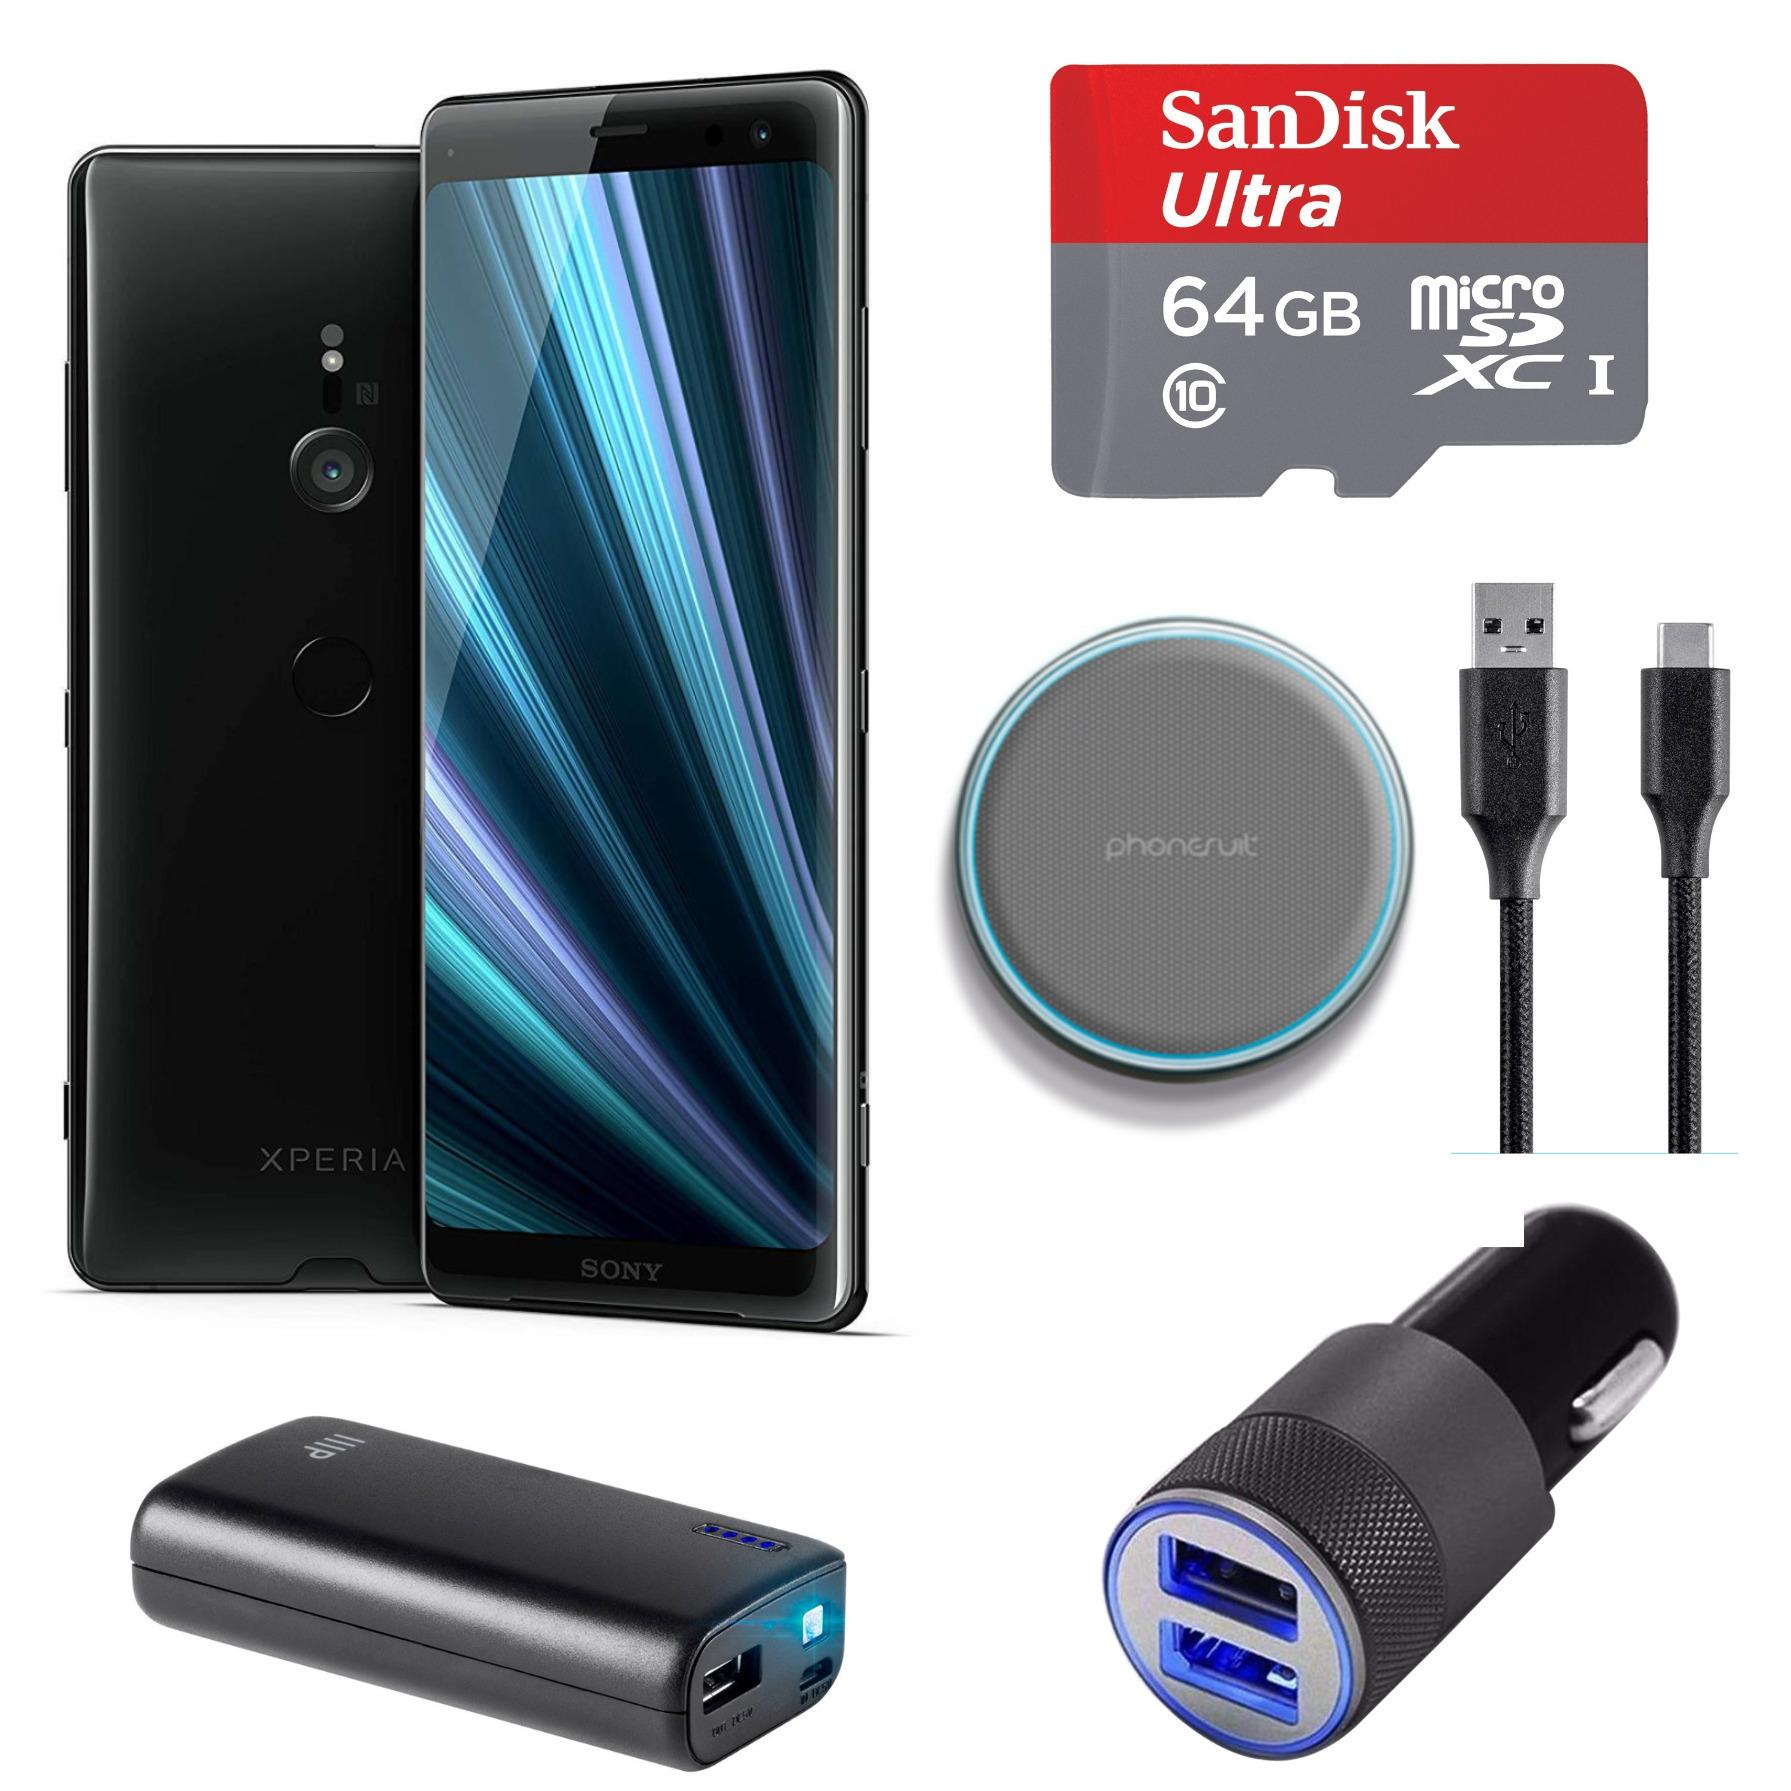 Sony XPERIA XZ3 Unlocked Smartphone (Black) Charging Bundle